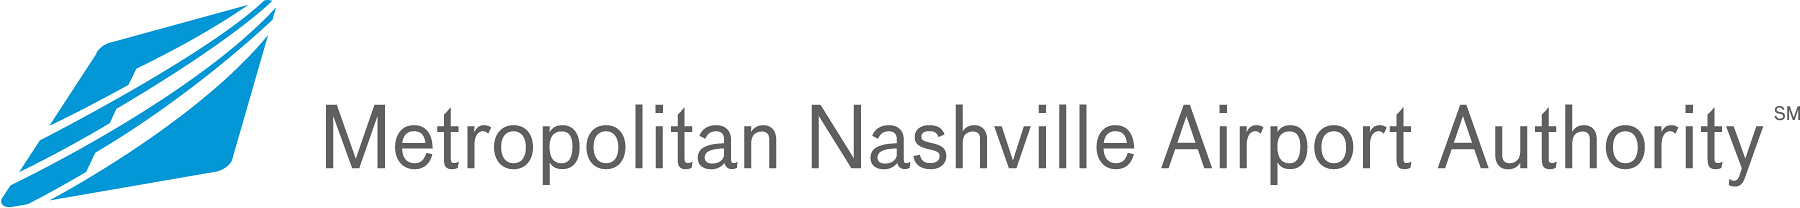 Metro Nashville Airport Authority